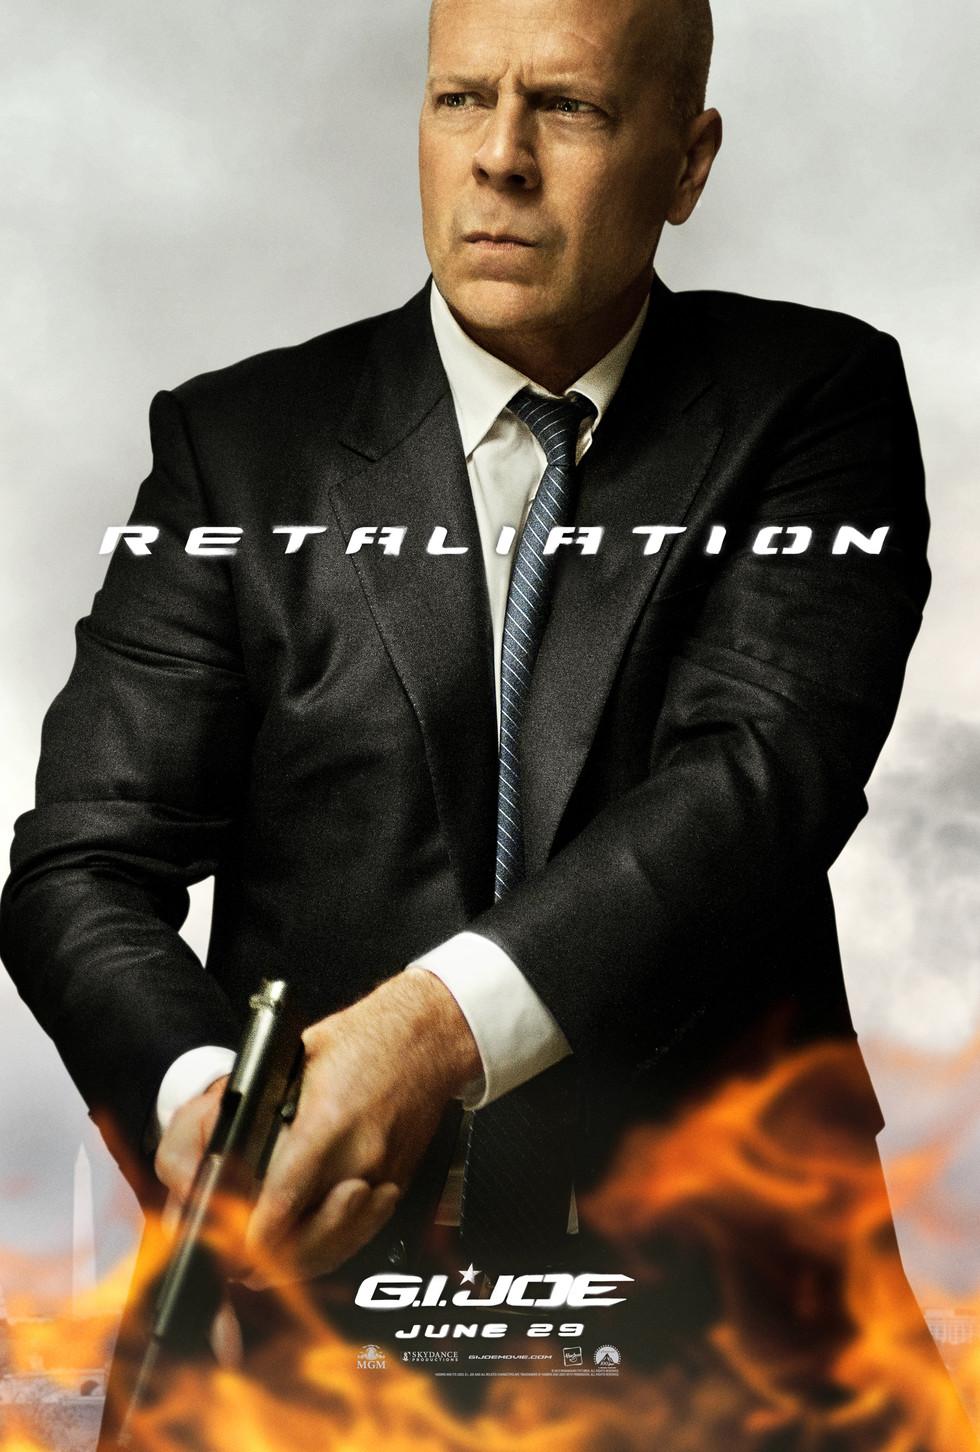 G.I. Joe: Retaliation - Movie Poster #3 (Large)